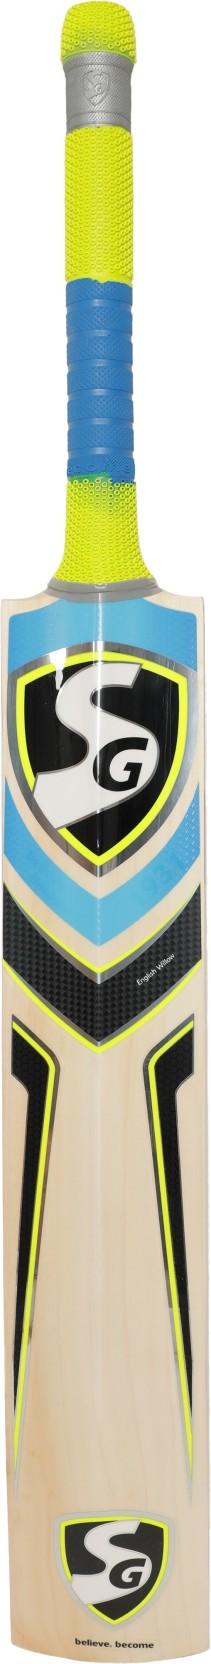 b1803923a SG NEXUS XTREME English Willow Cricket Bat - Buy SG NEXUS XTREME ...